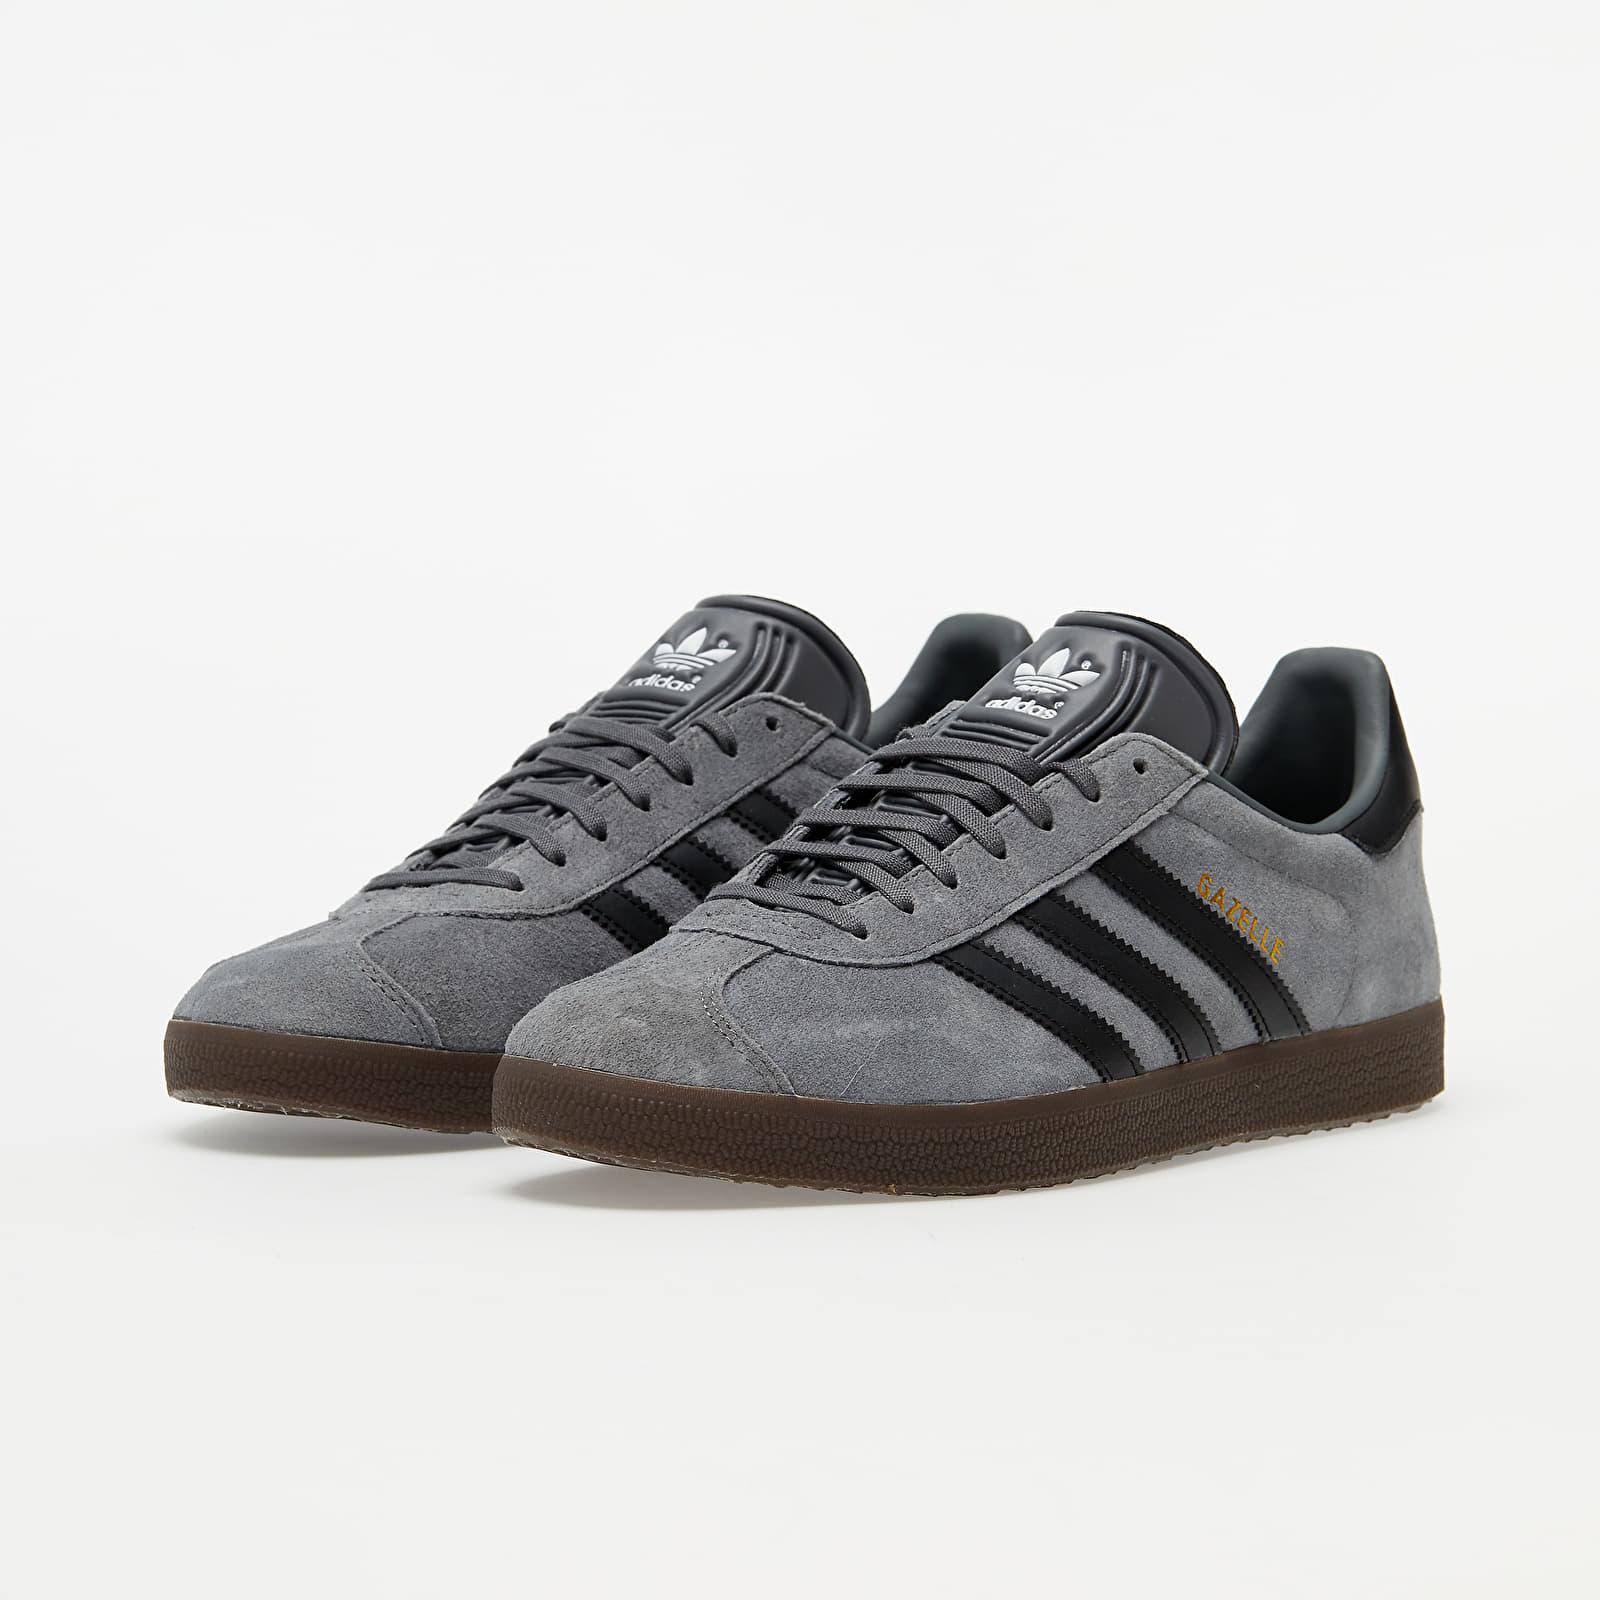 Men's shoes adidas Gazelle Grey Four